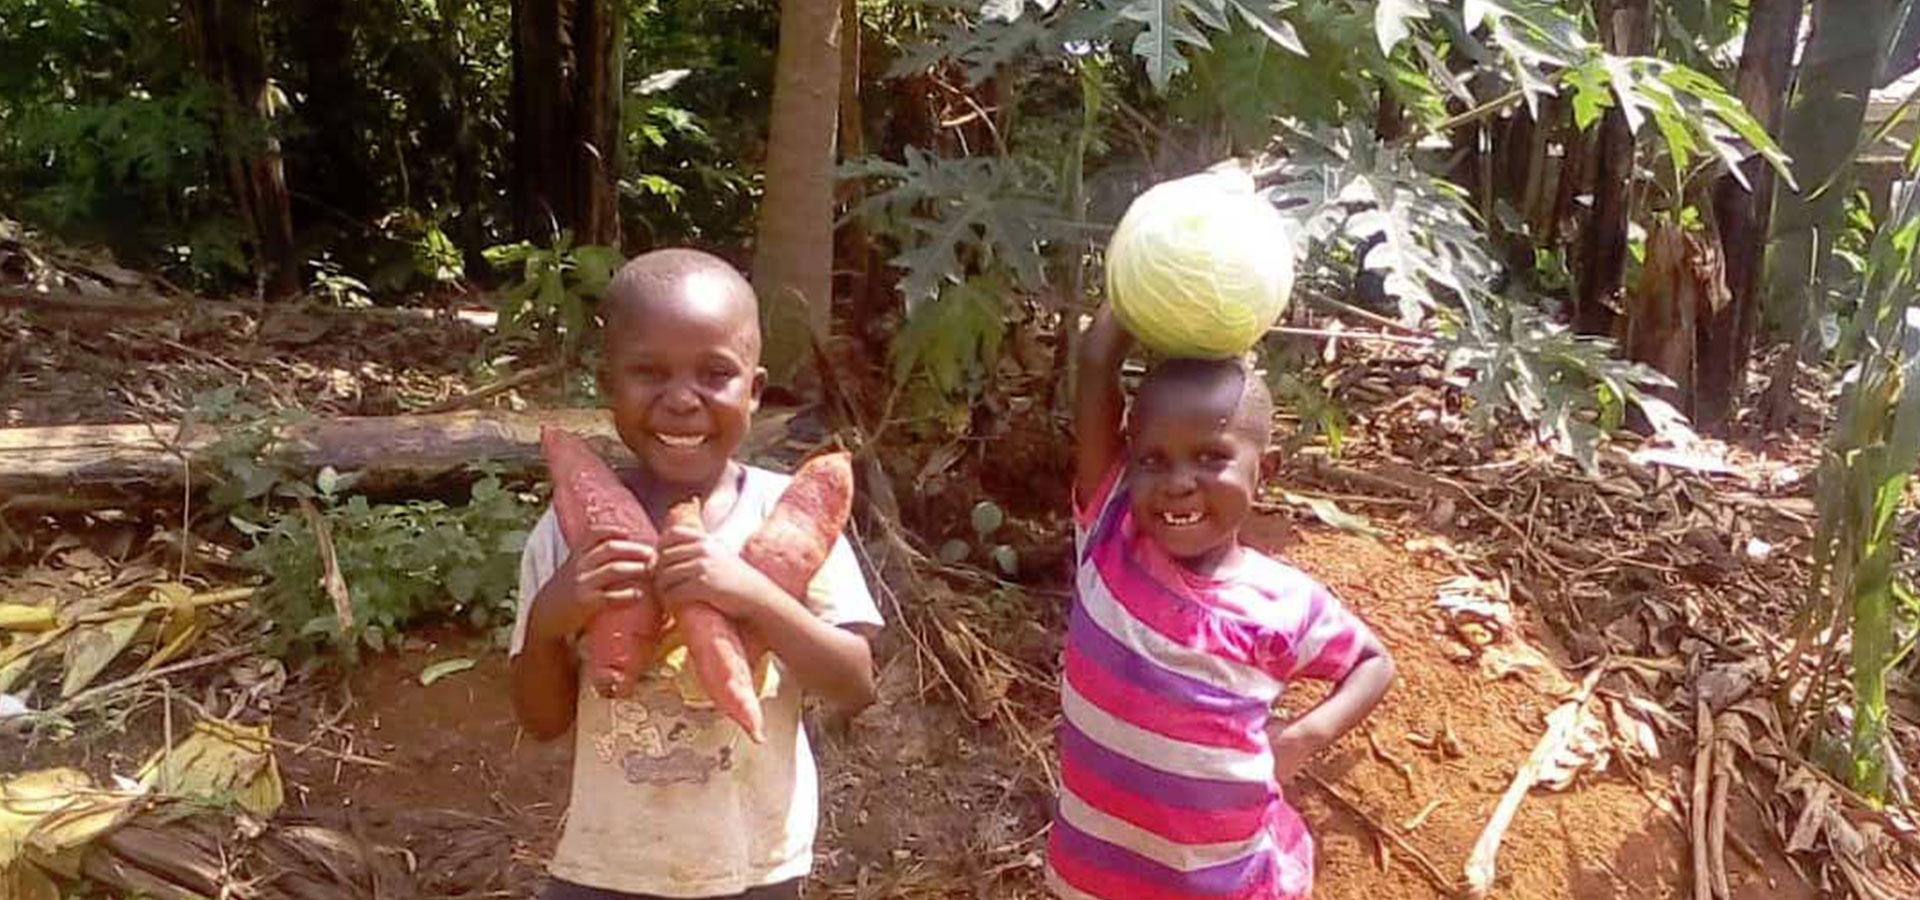 Has Childrens Hospital - Has Childrens Foundation Good Food